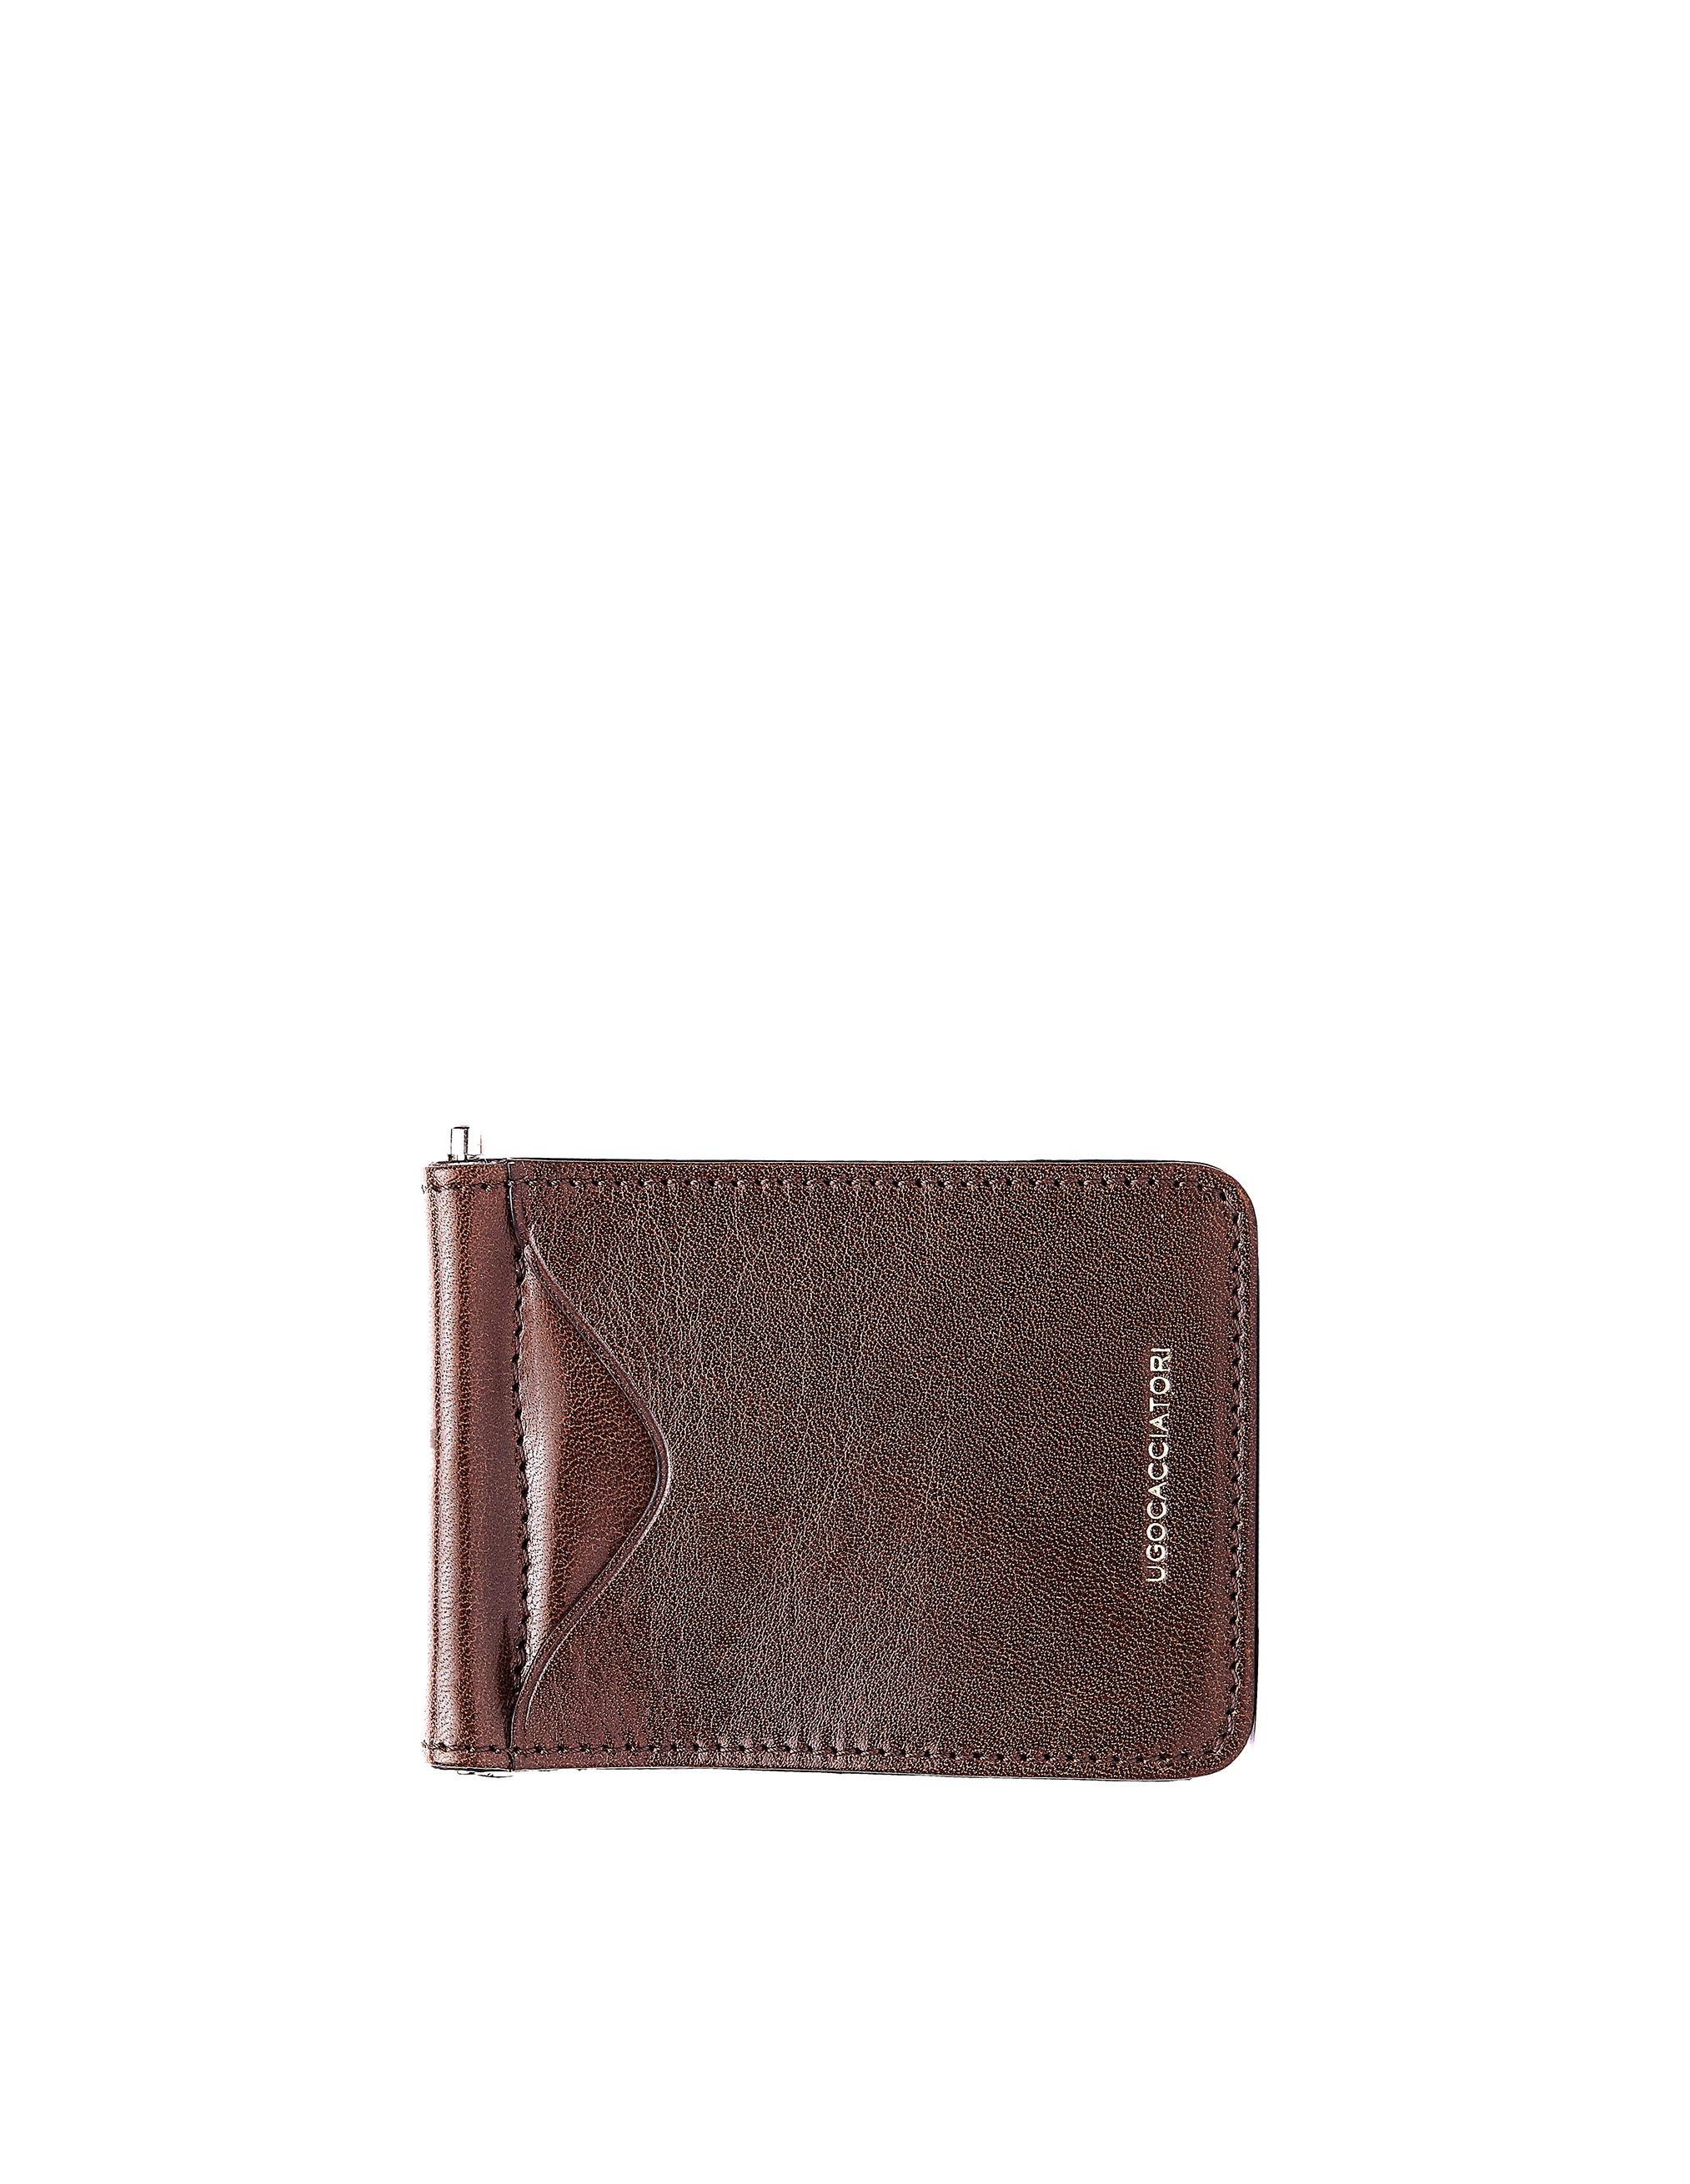 Ugo Cacciatori Brown Leather Clip Card Holder